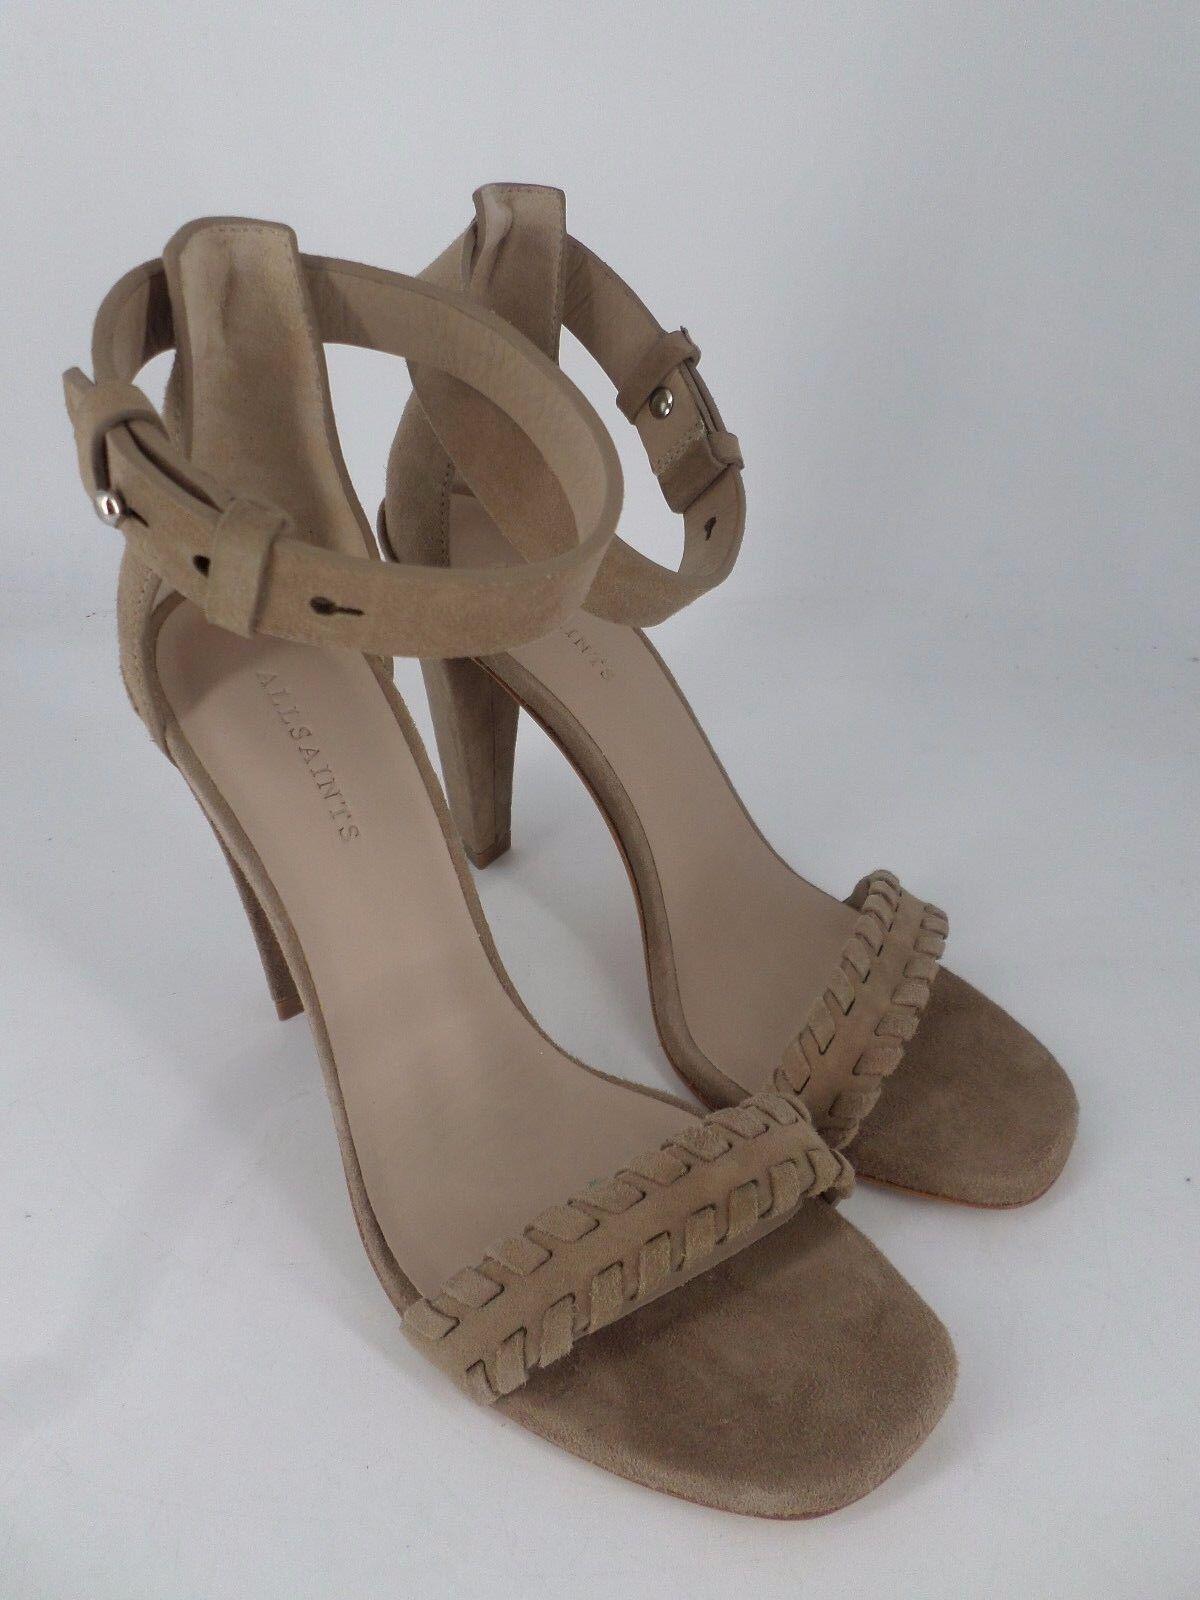 All Saints Effie Heeled Sandals UK 4 EU 37 LN29 77 SALEs